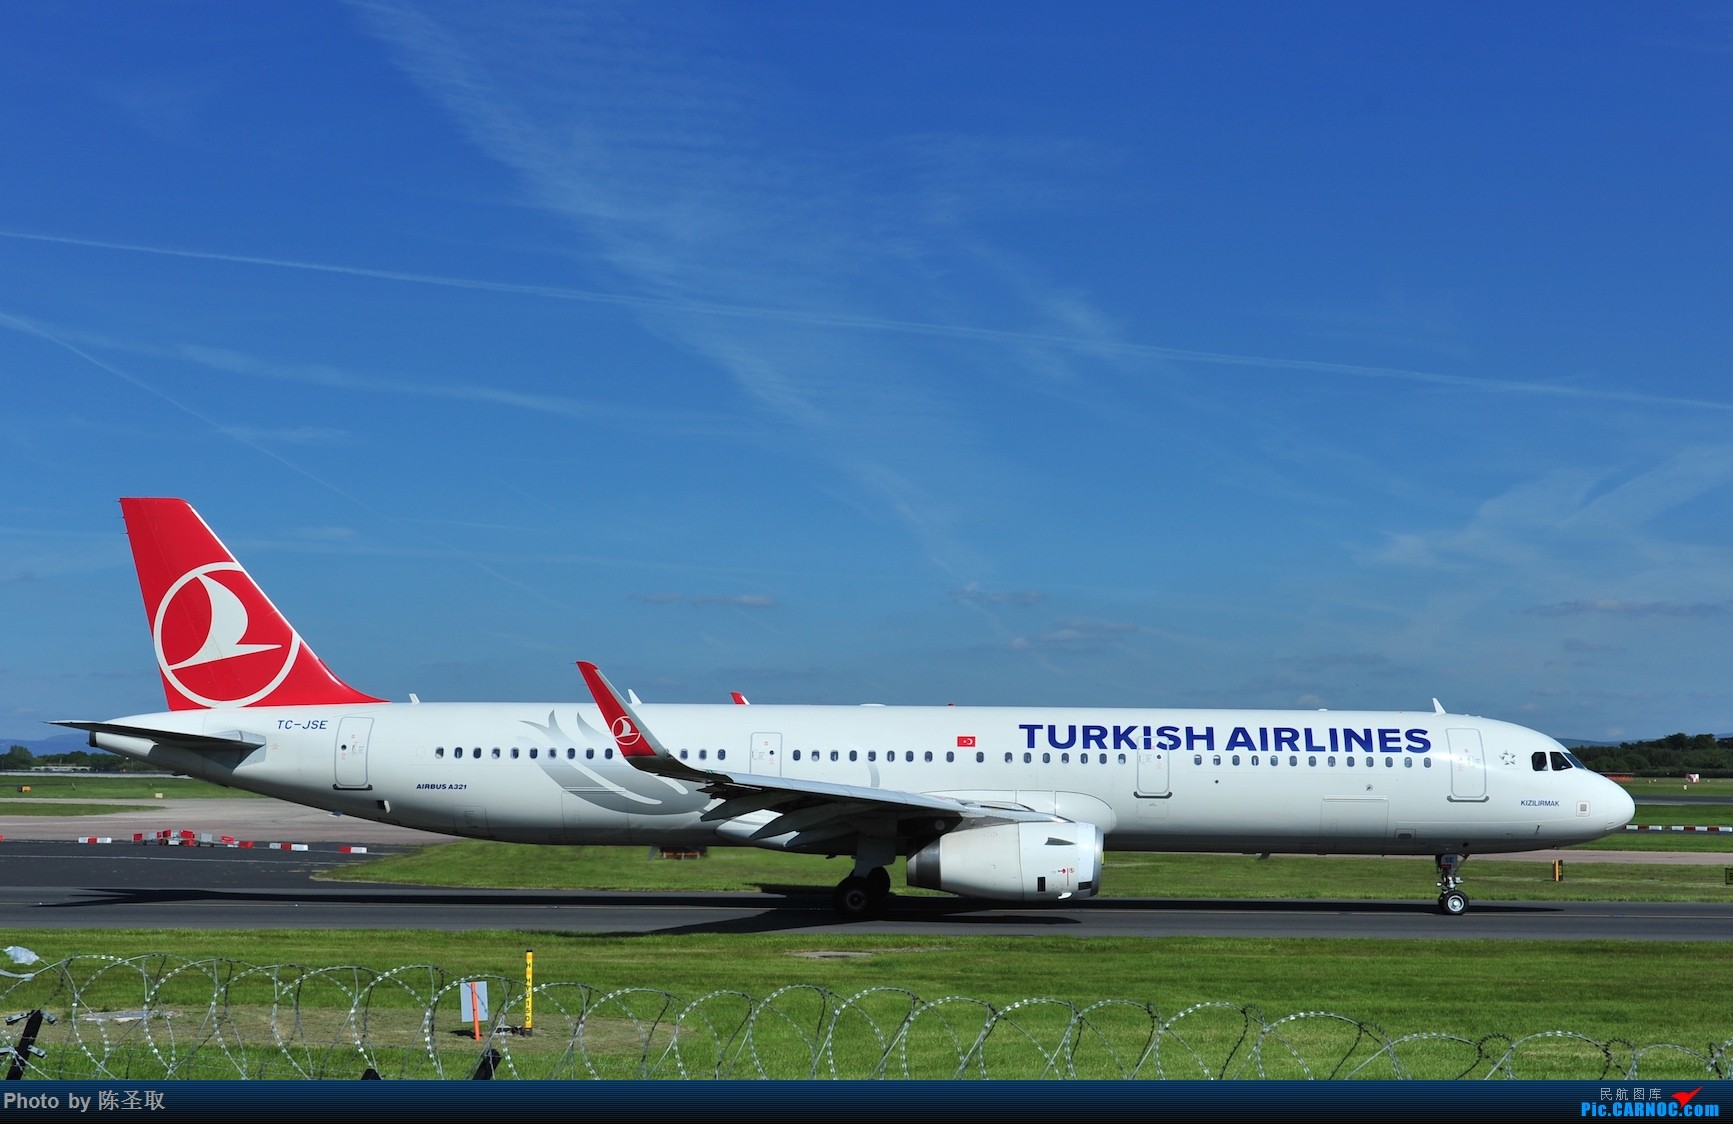 Re:[原创]迟来的6月曼城拍机图。廉价航空的天堂,曼彻斯特机场~ AIRBUS A321-231 TC-JSE 英国曼彻斯特机场